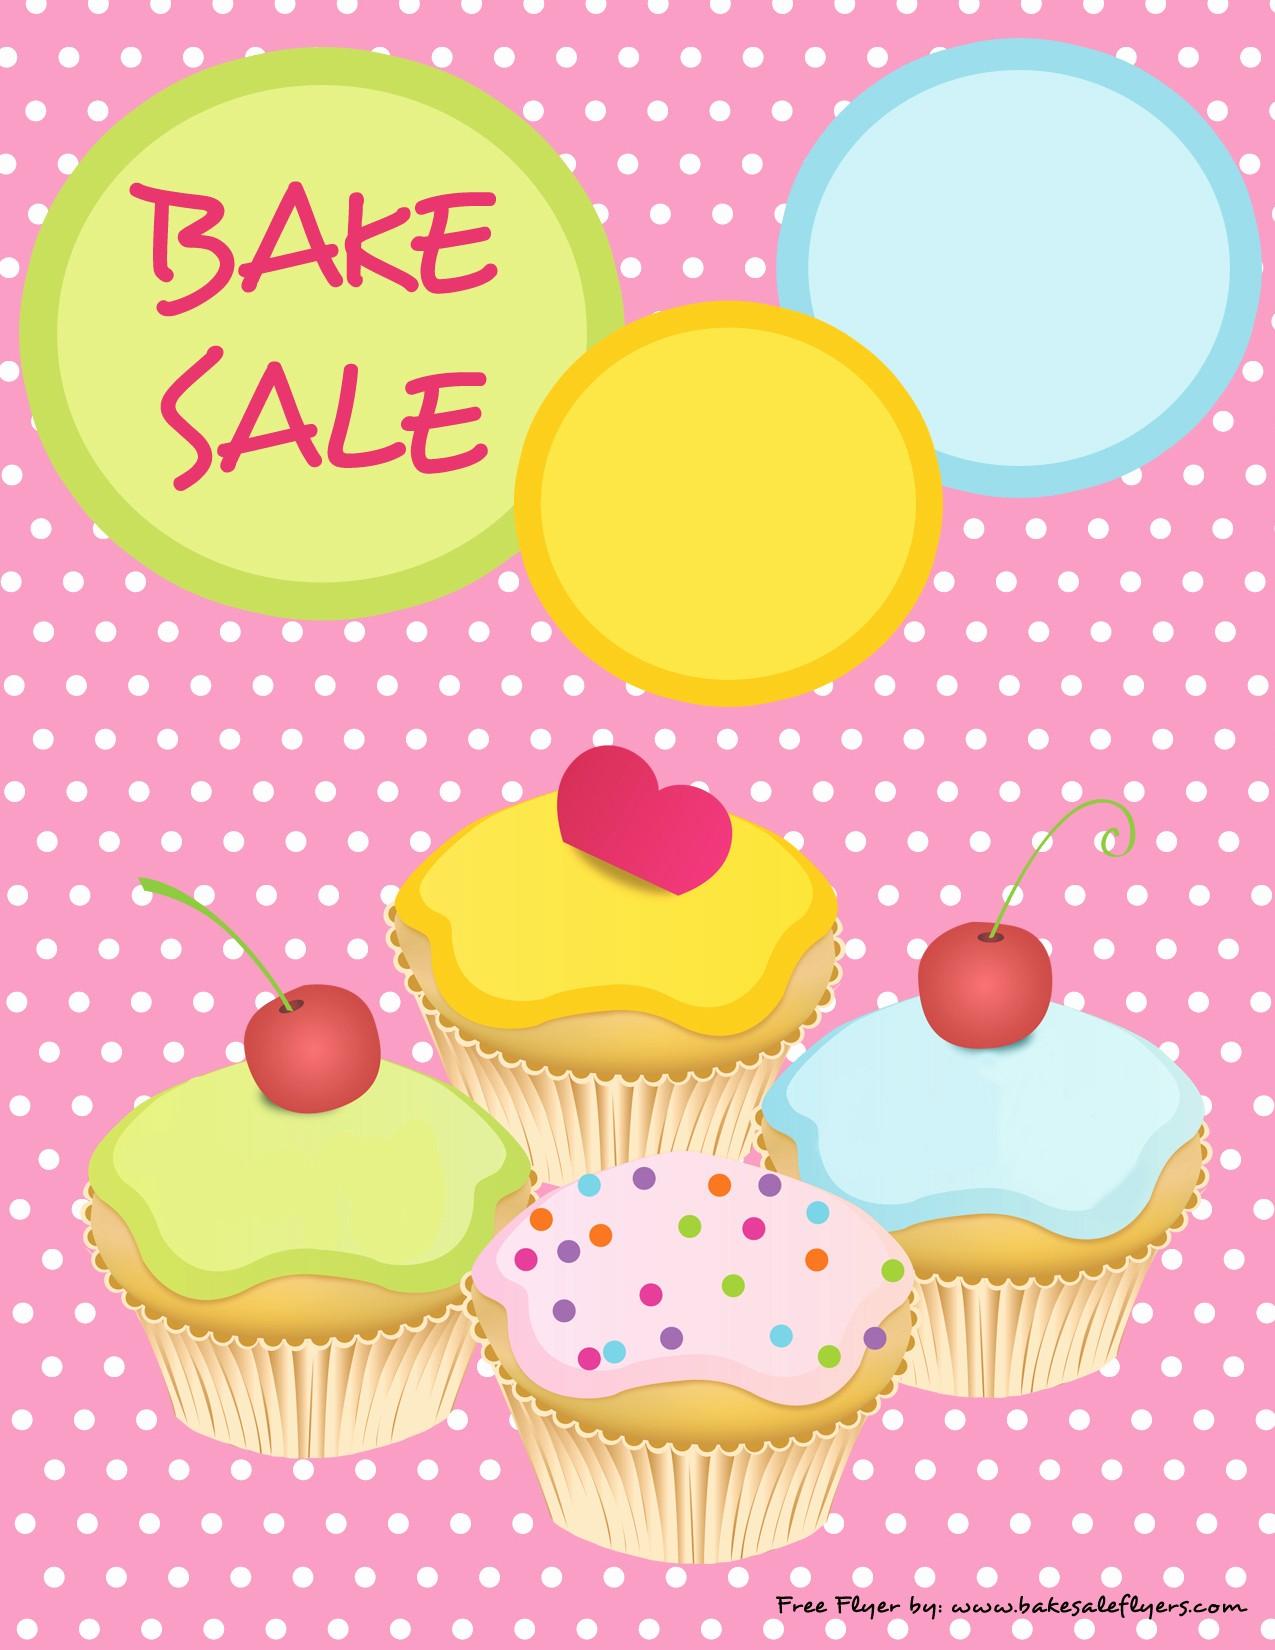 Bake Sale Flyer Template Microsoft Beautiful Best S Of Bake Sale Template Microsoft Word Free